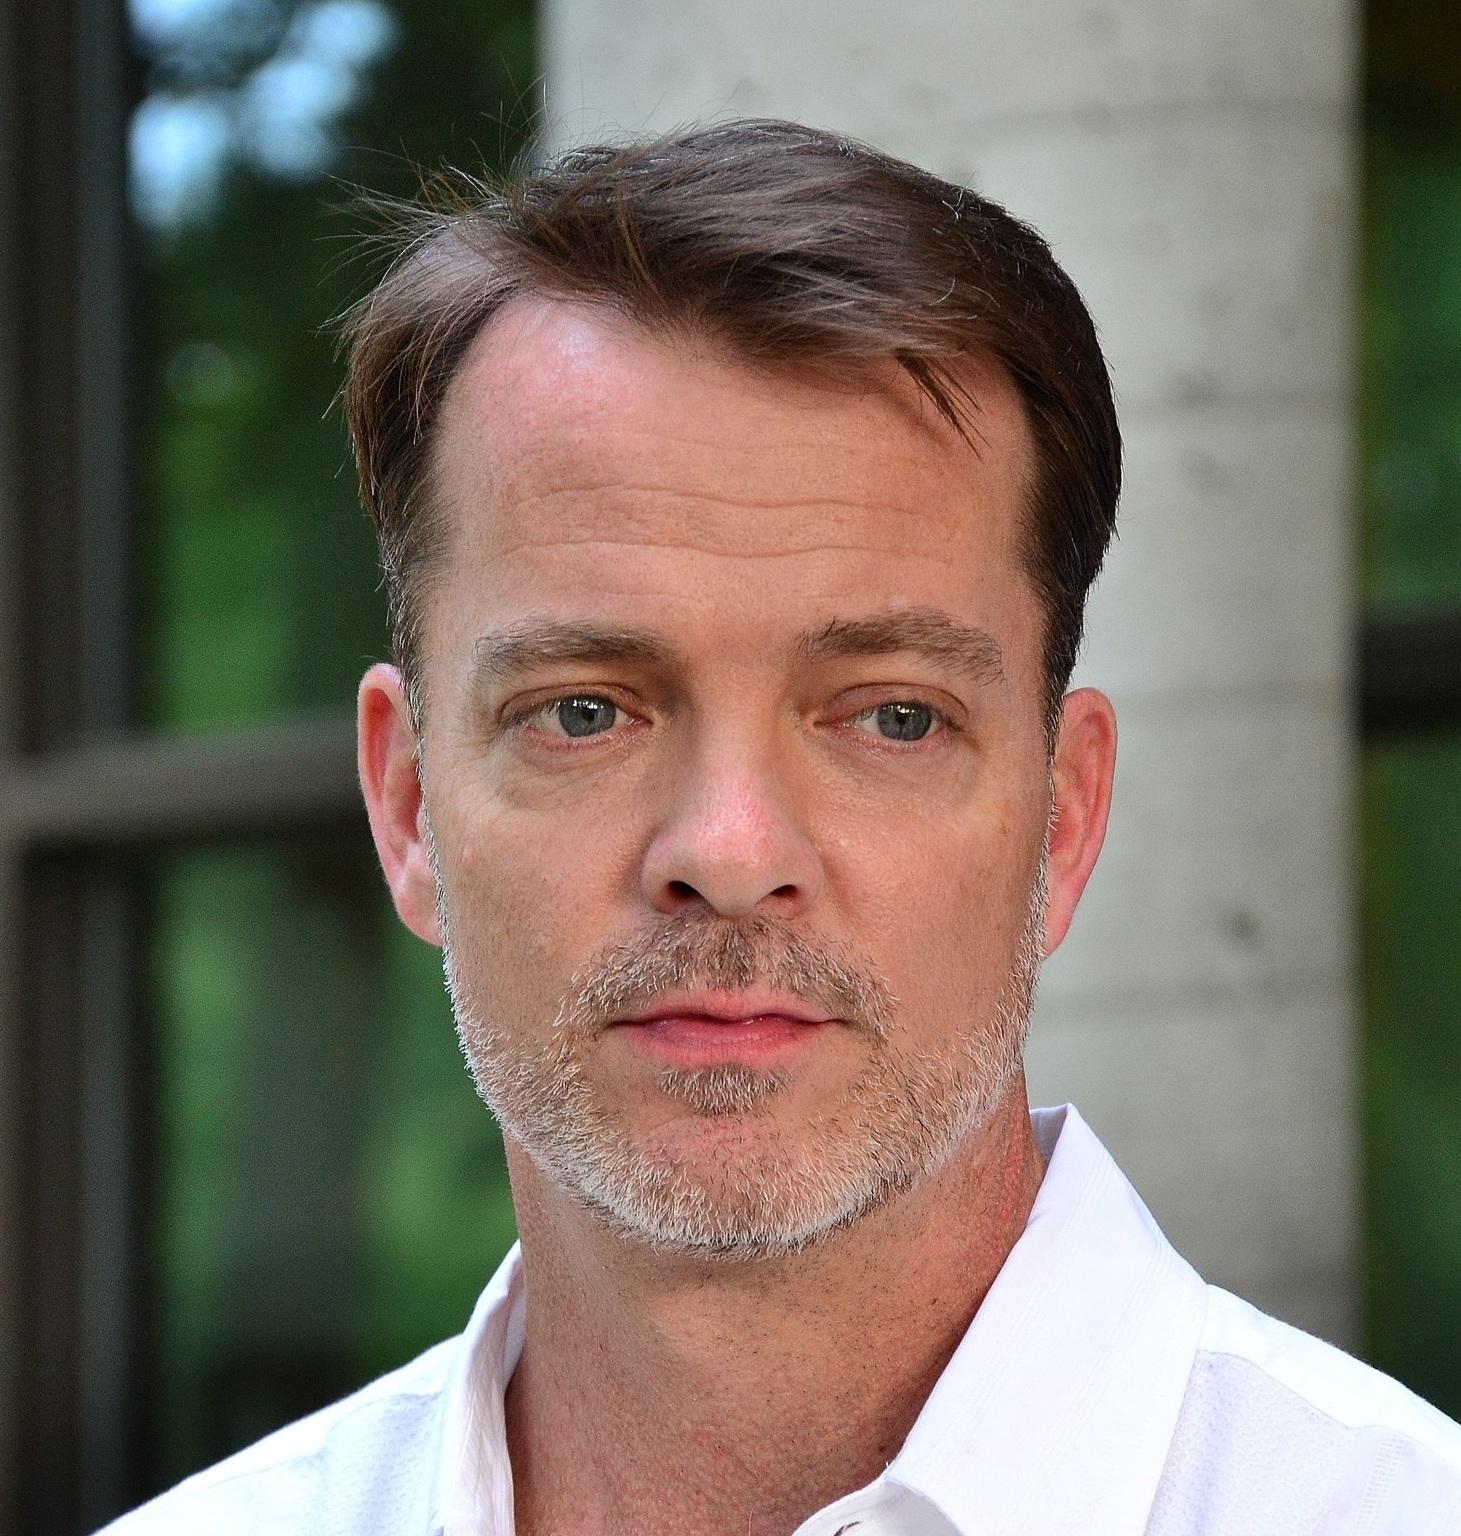 Instructor Barney O'Hanlon